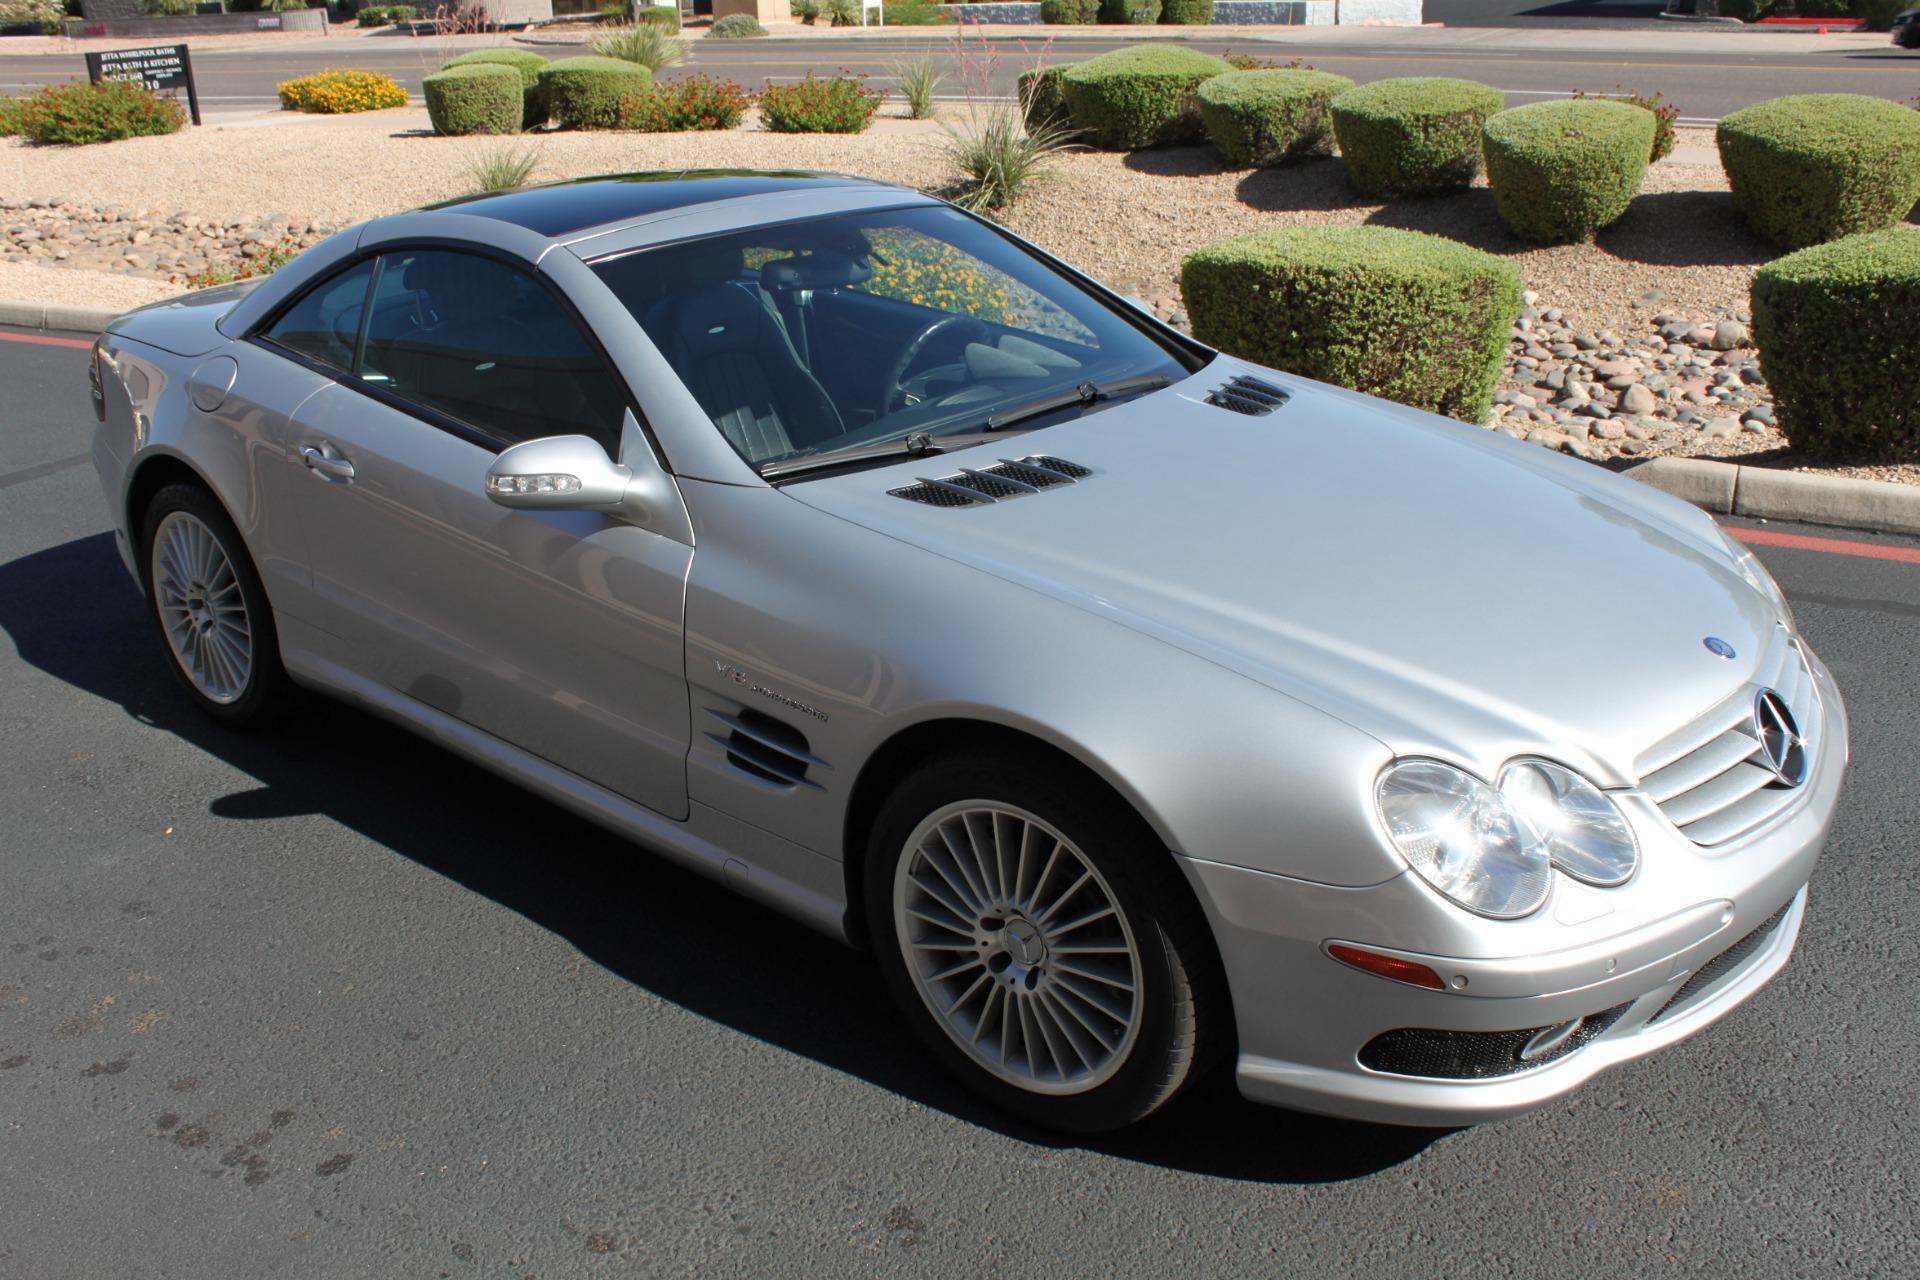 Used-2003-Mercedes-Benz-SL-Class-AMG-Camaro